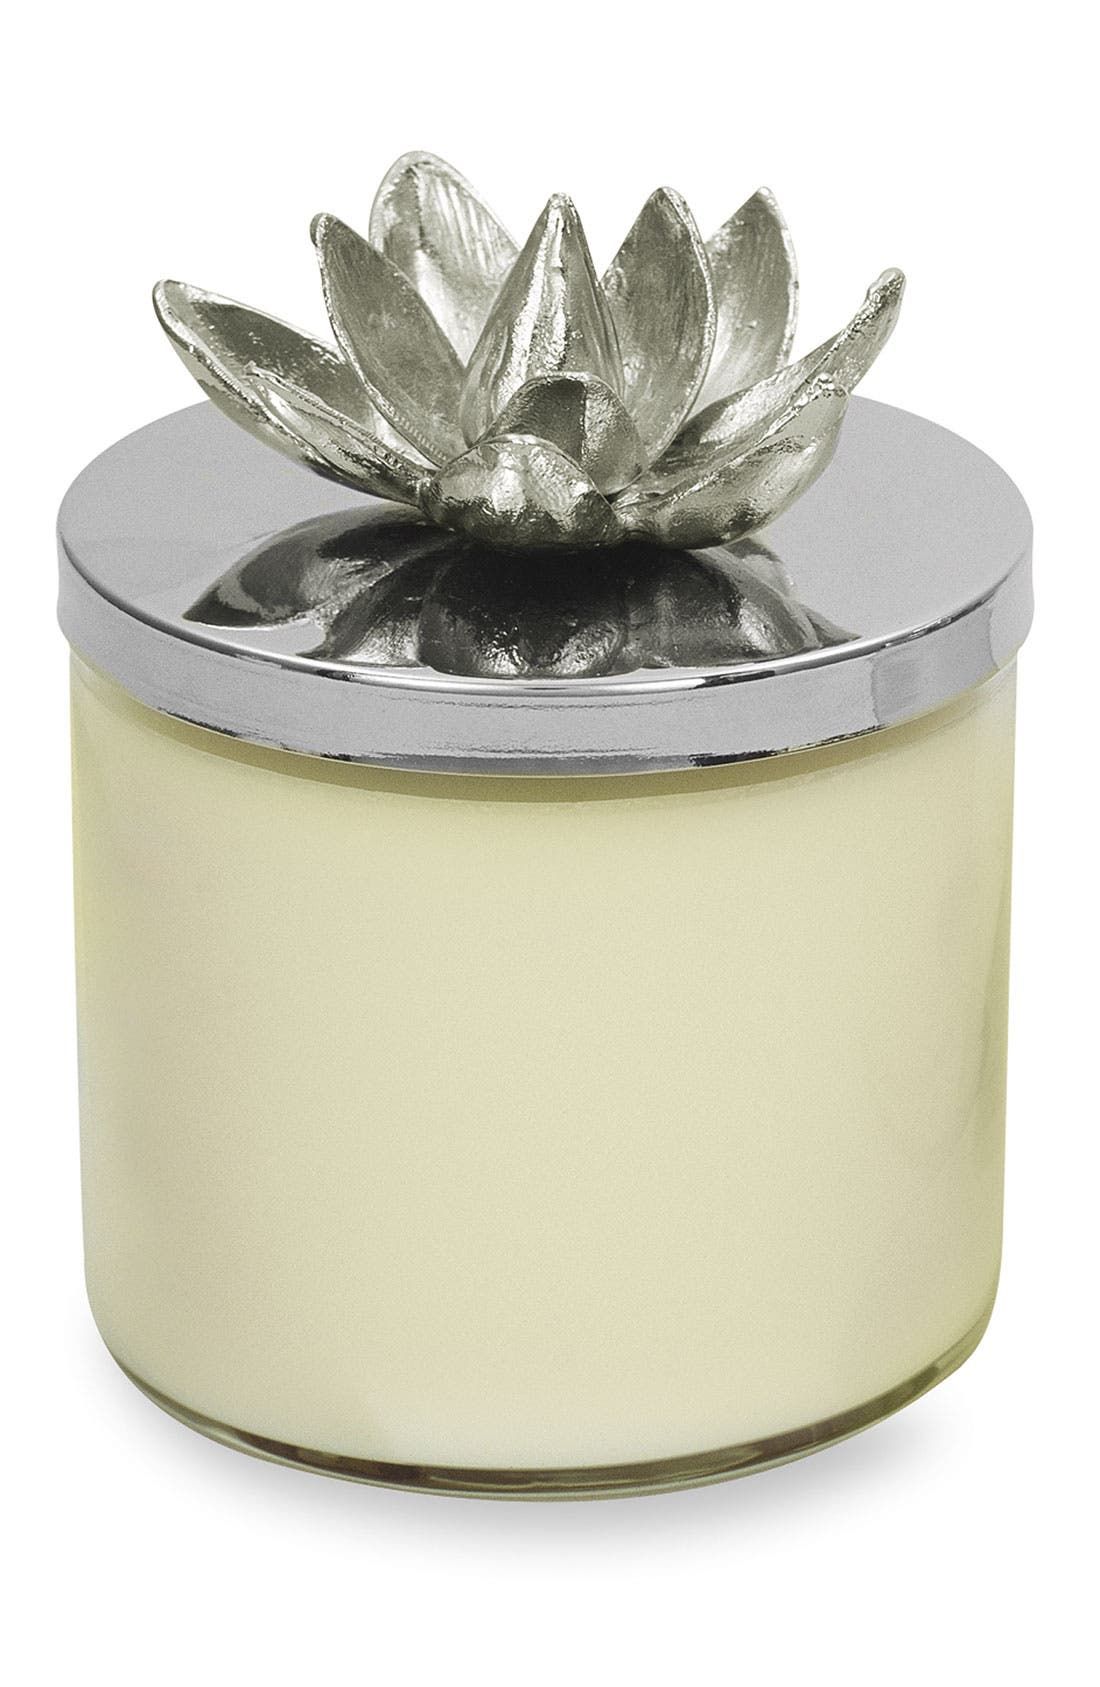 Main Image - Michael Aram 'Lotus Blossom' Soy Wax Candle